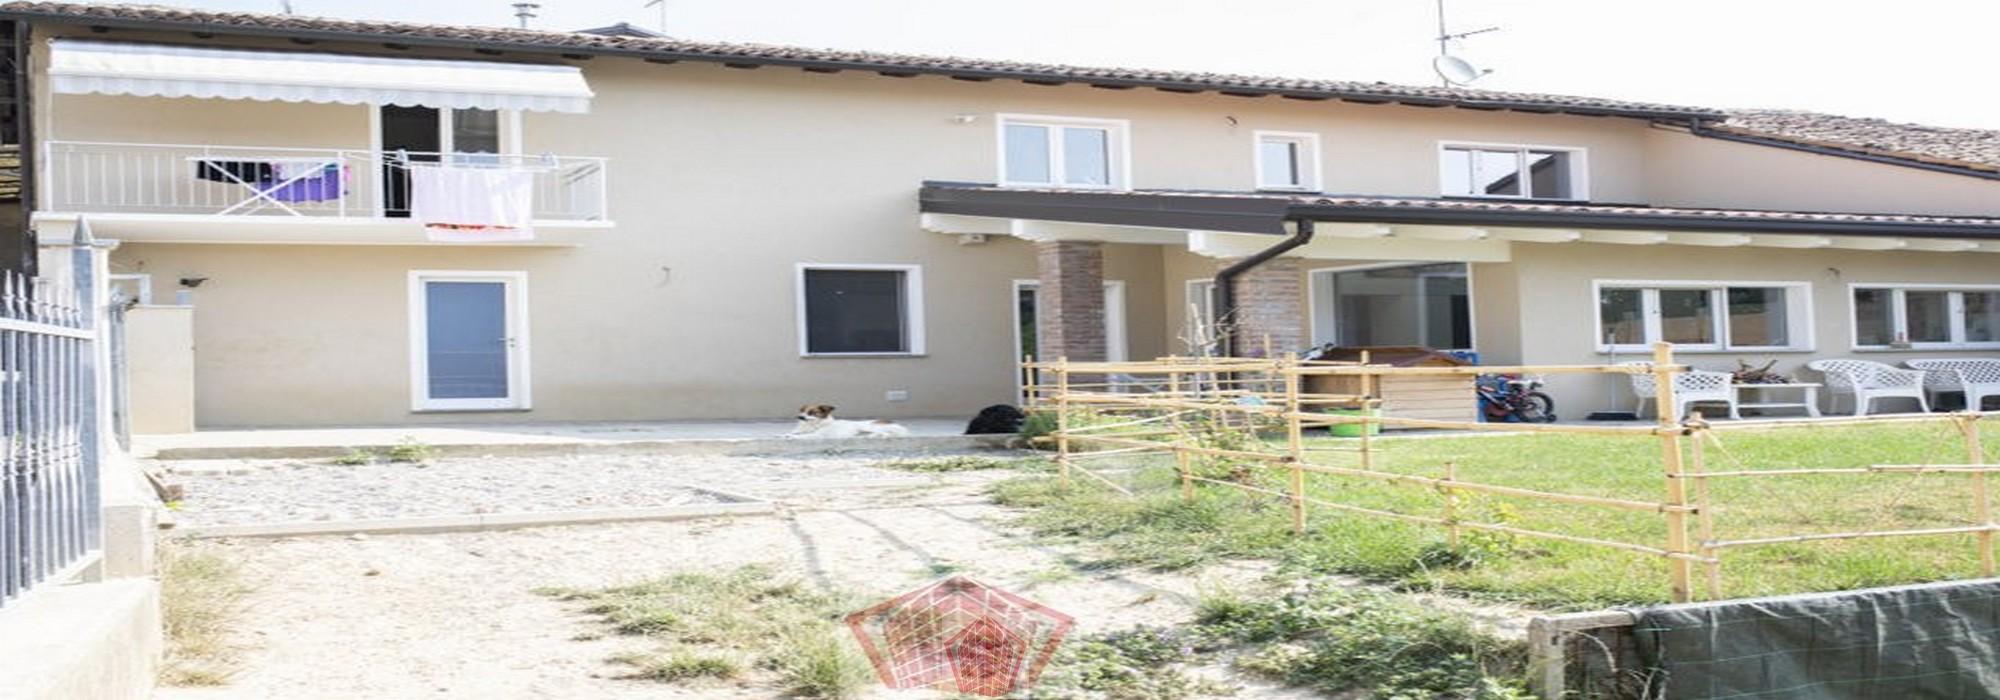 Canneto Pavese PV VENDITA Casa singola con giardino Rif. 349